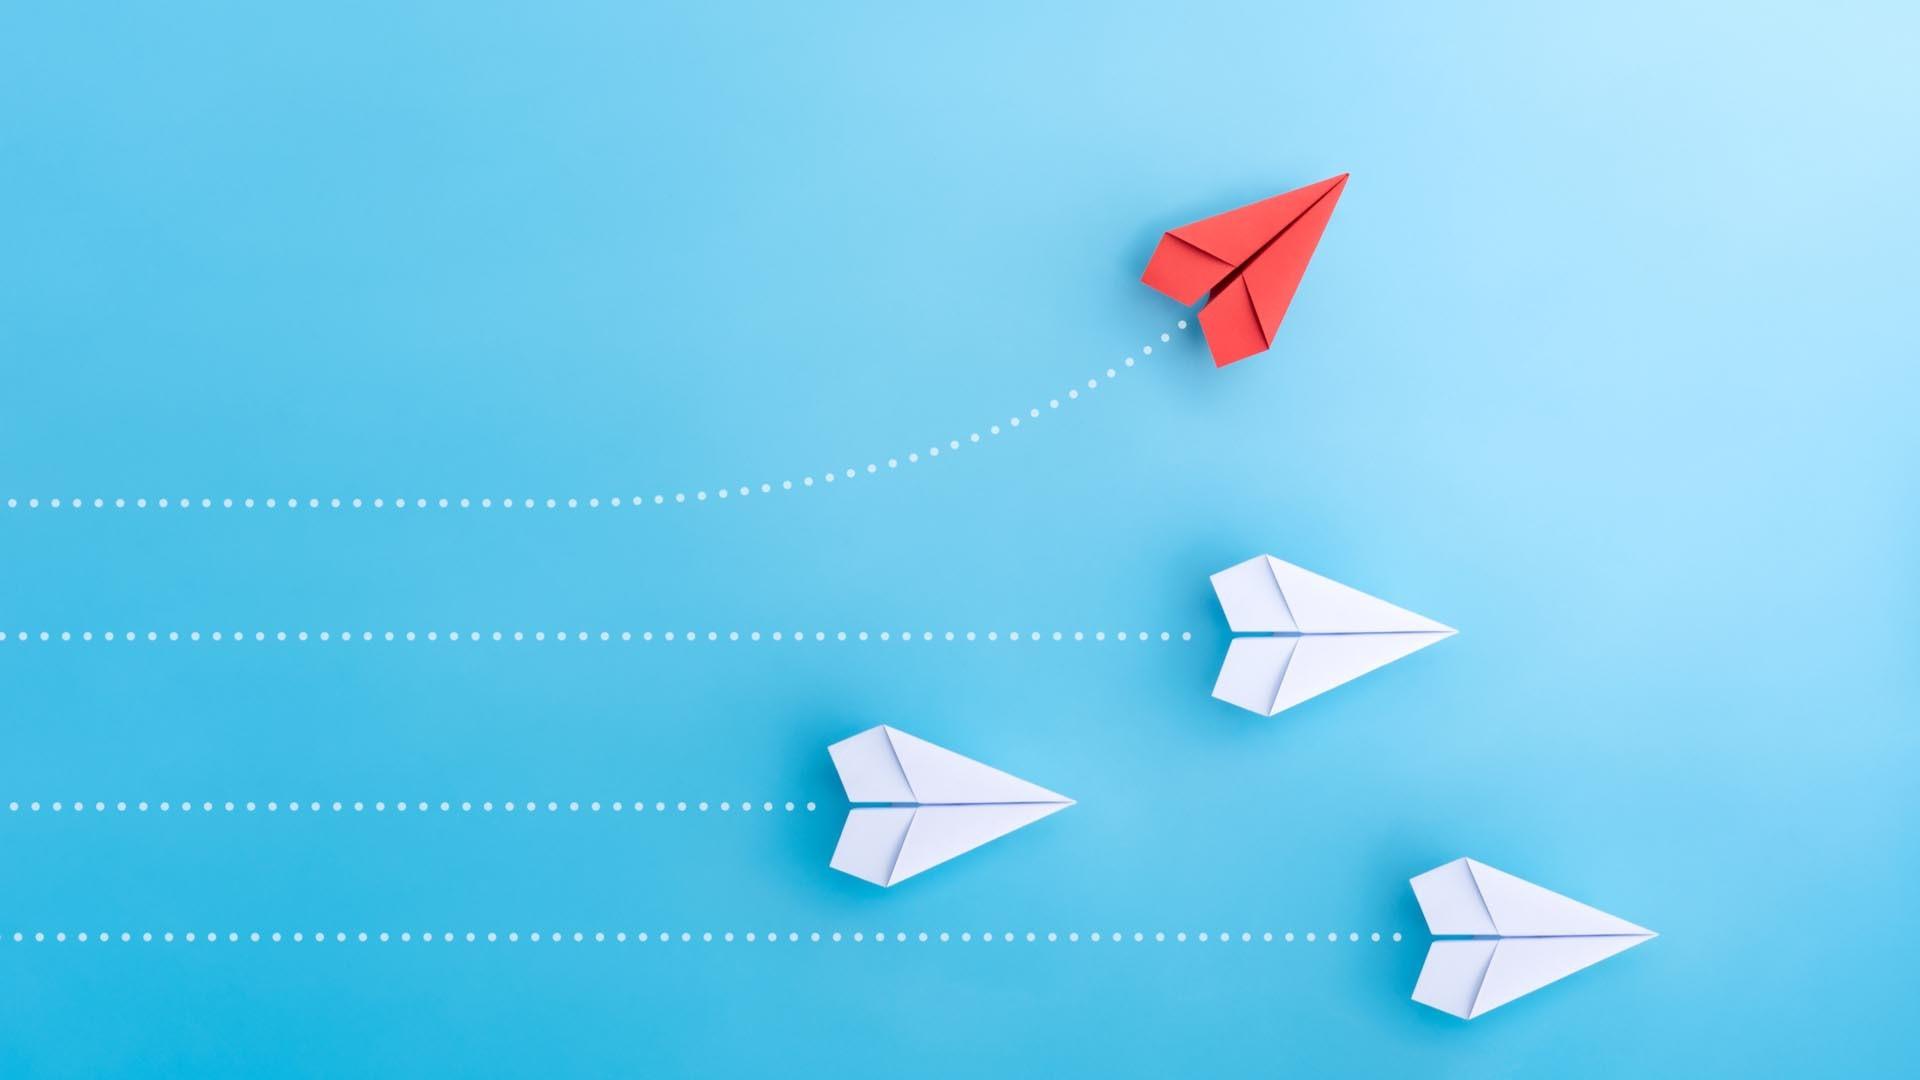 Paper Airplane desktop wallpaper